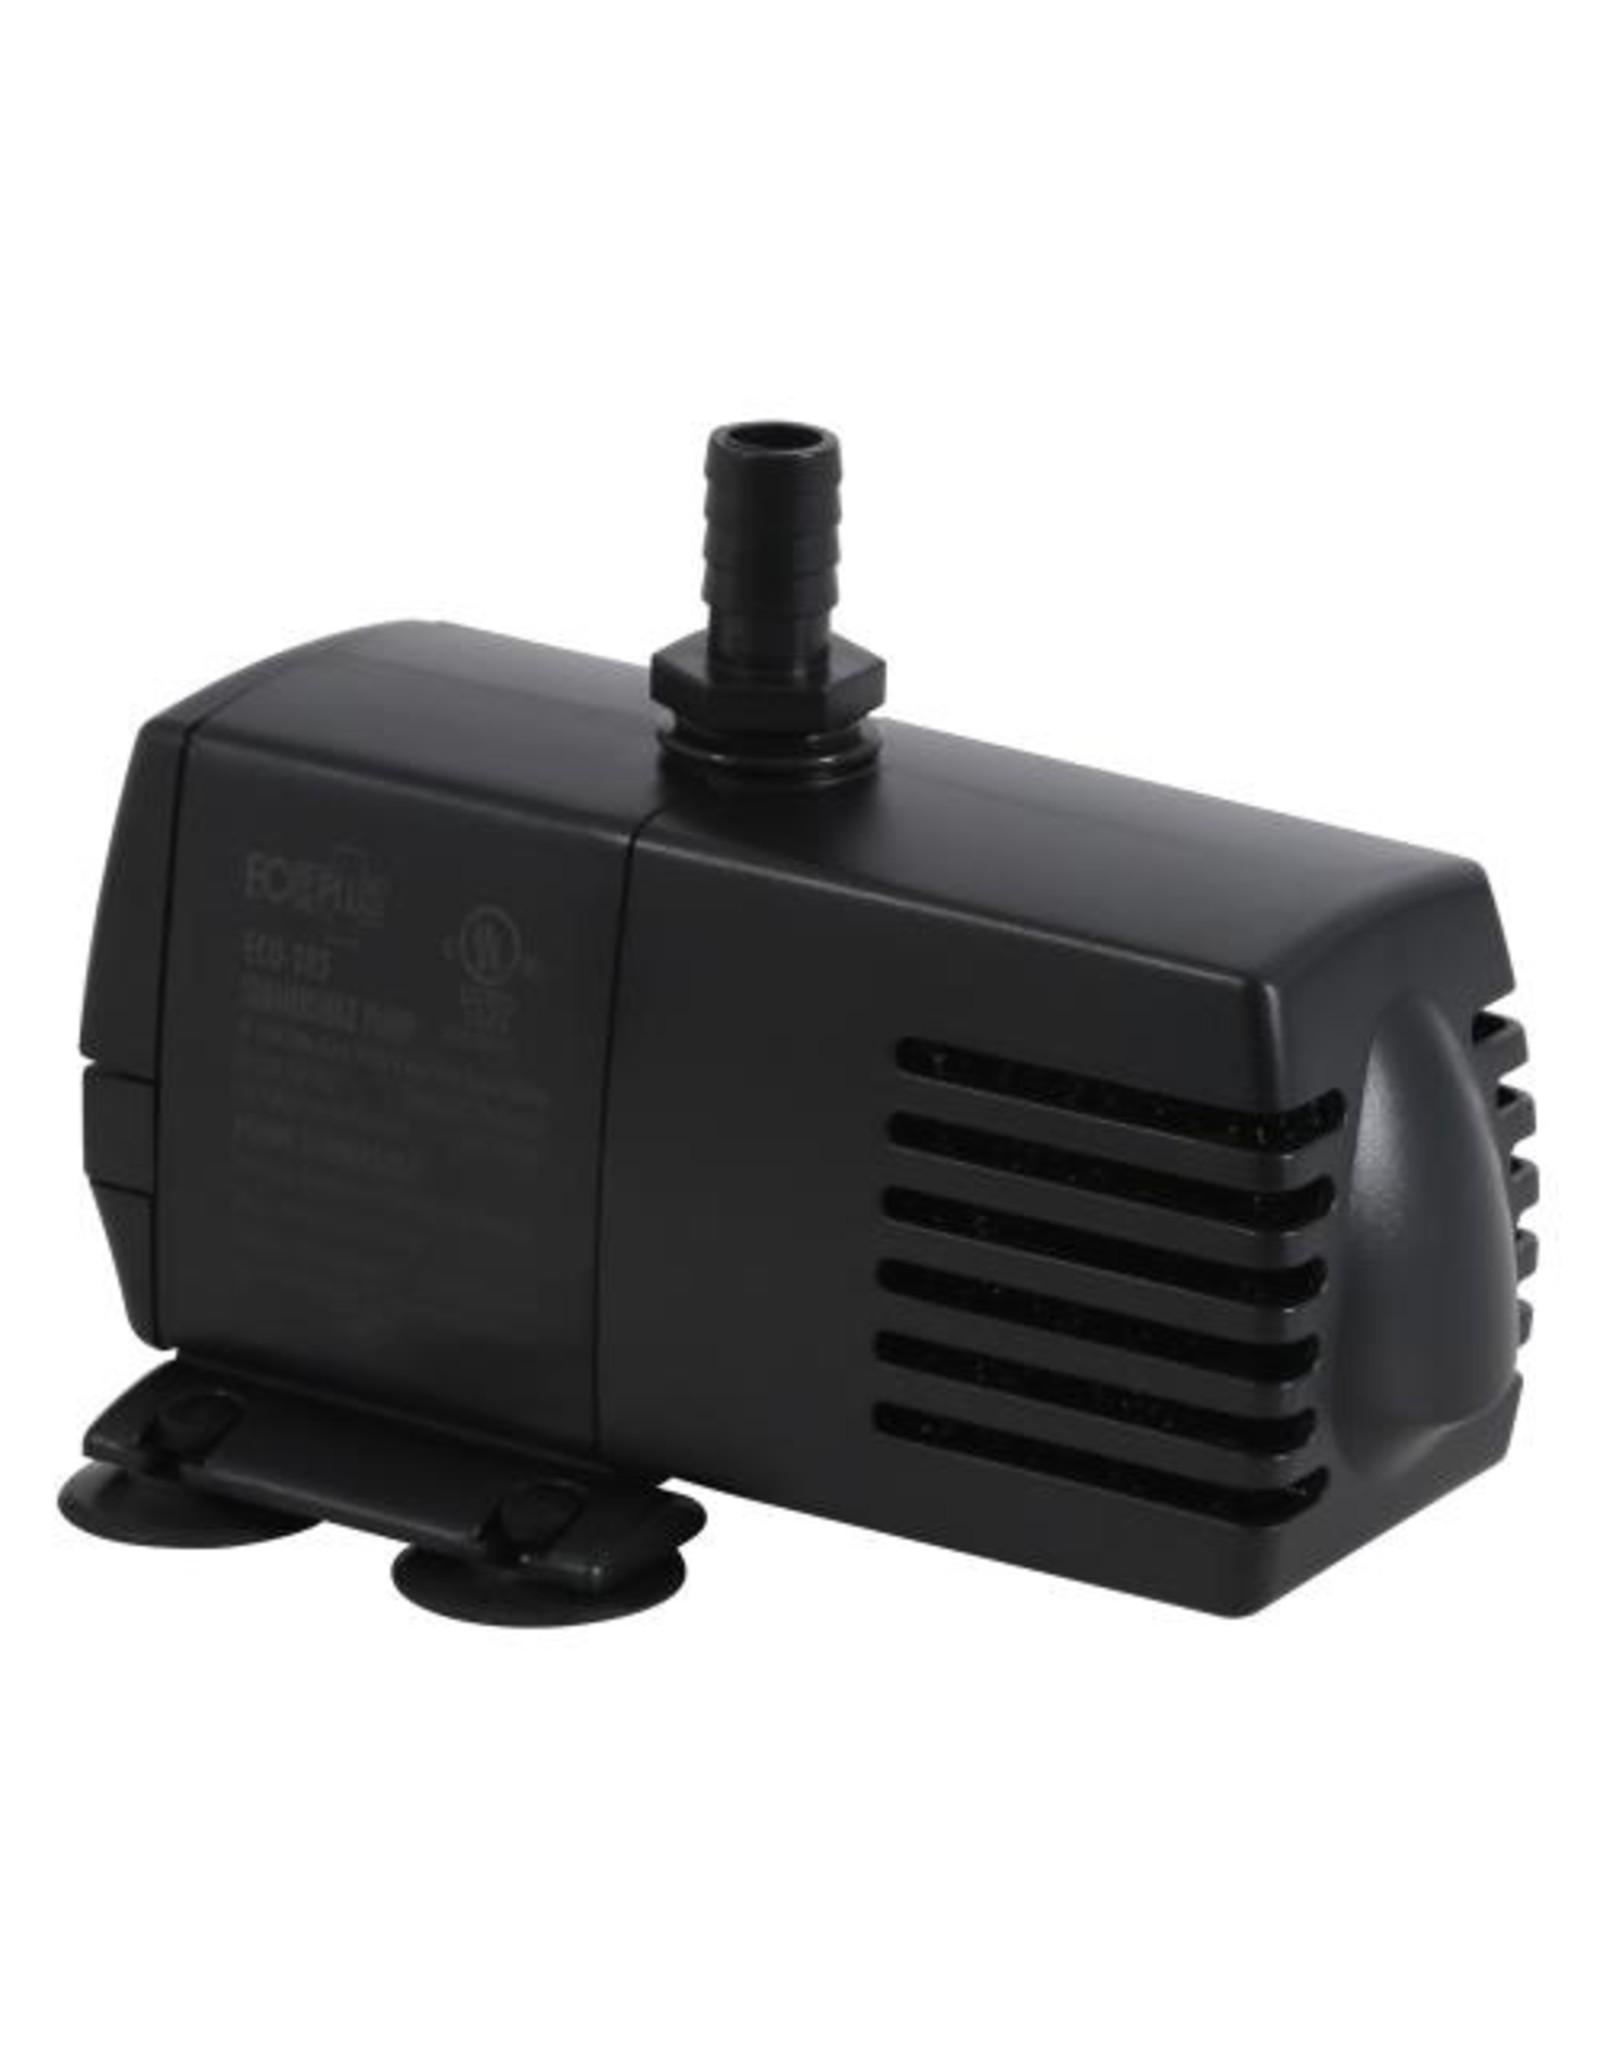 EcoPlus 185 Submersible Pump